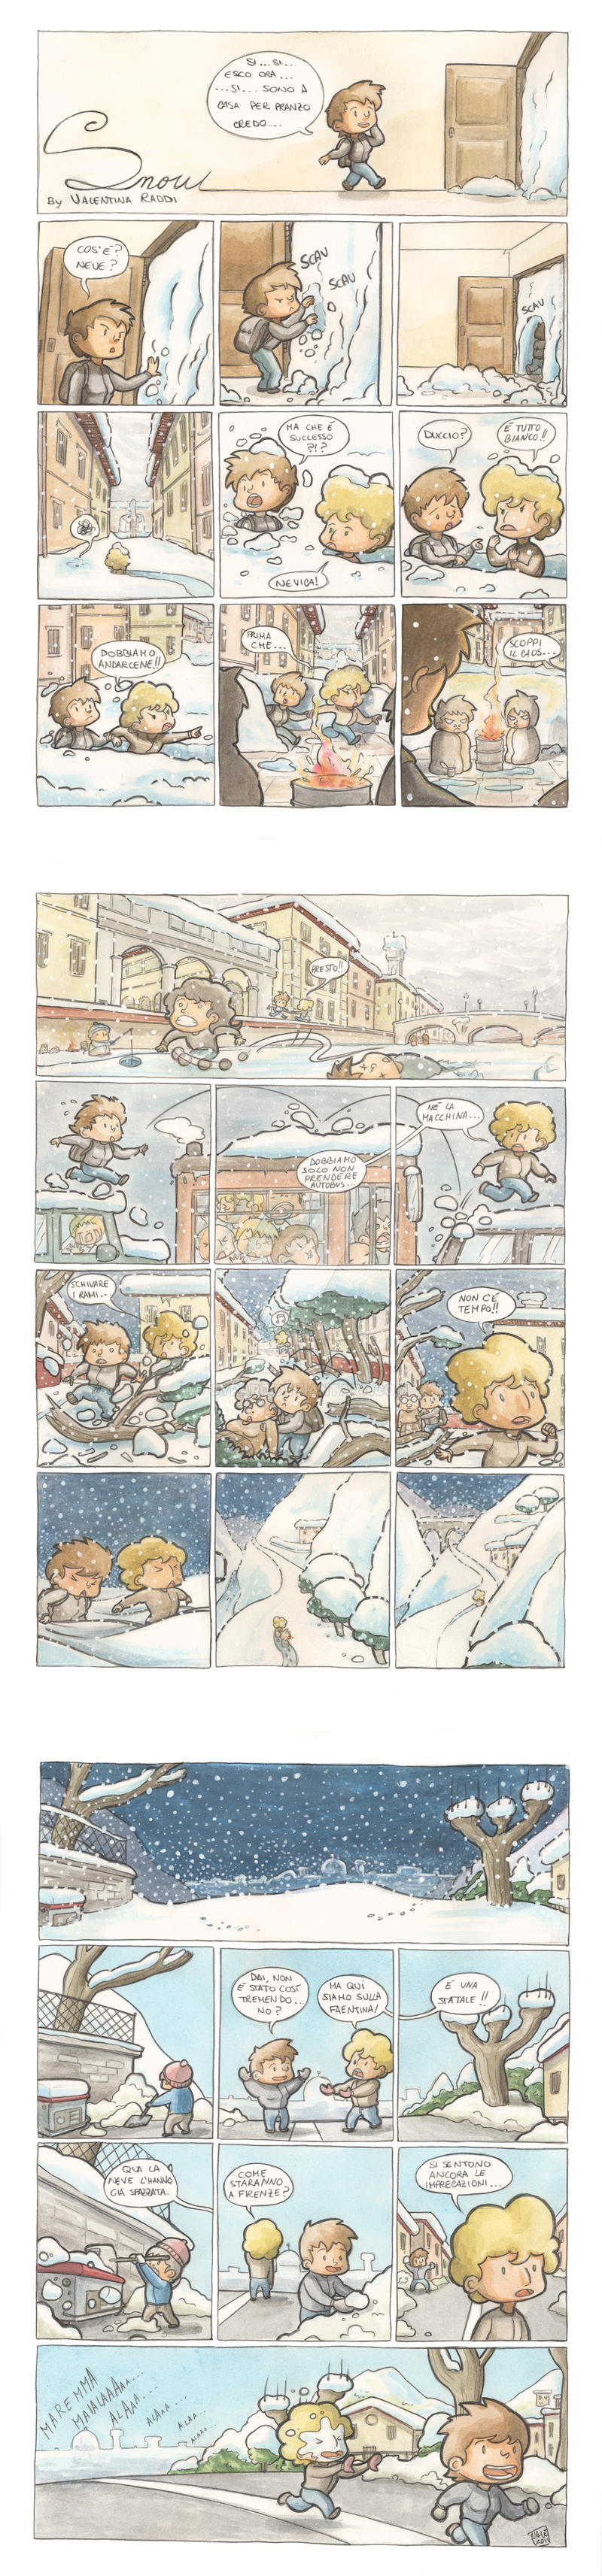 La neve a Firenze by Gyrard